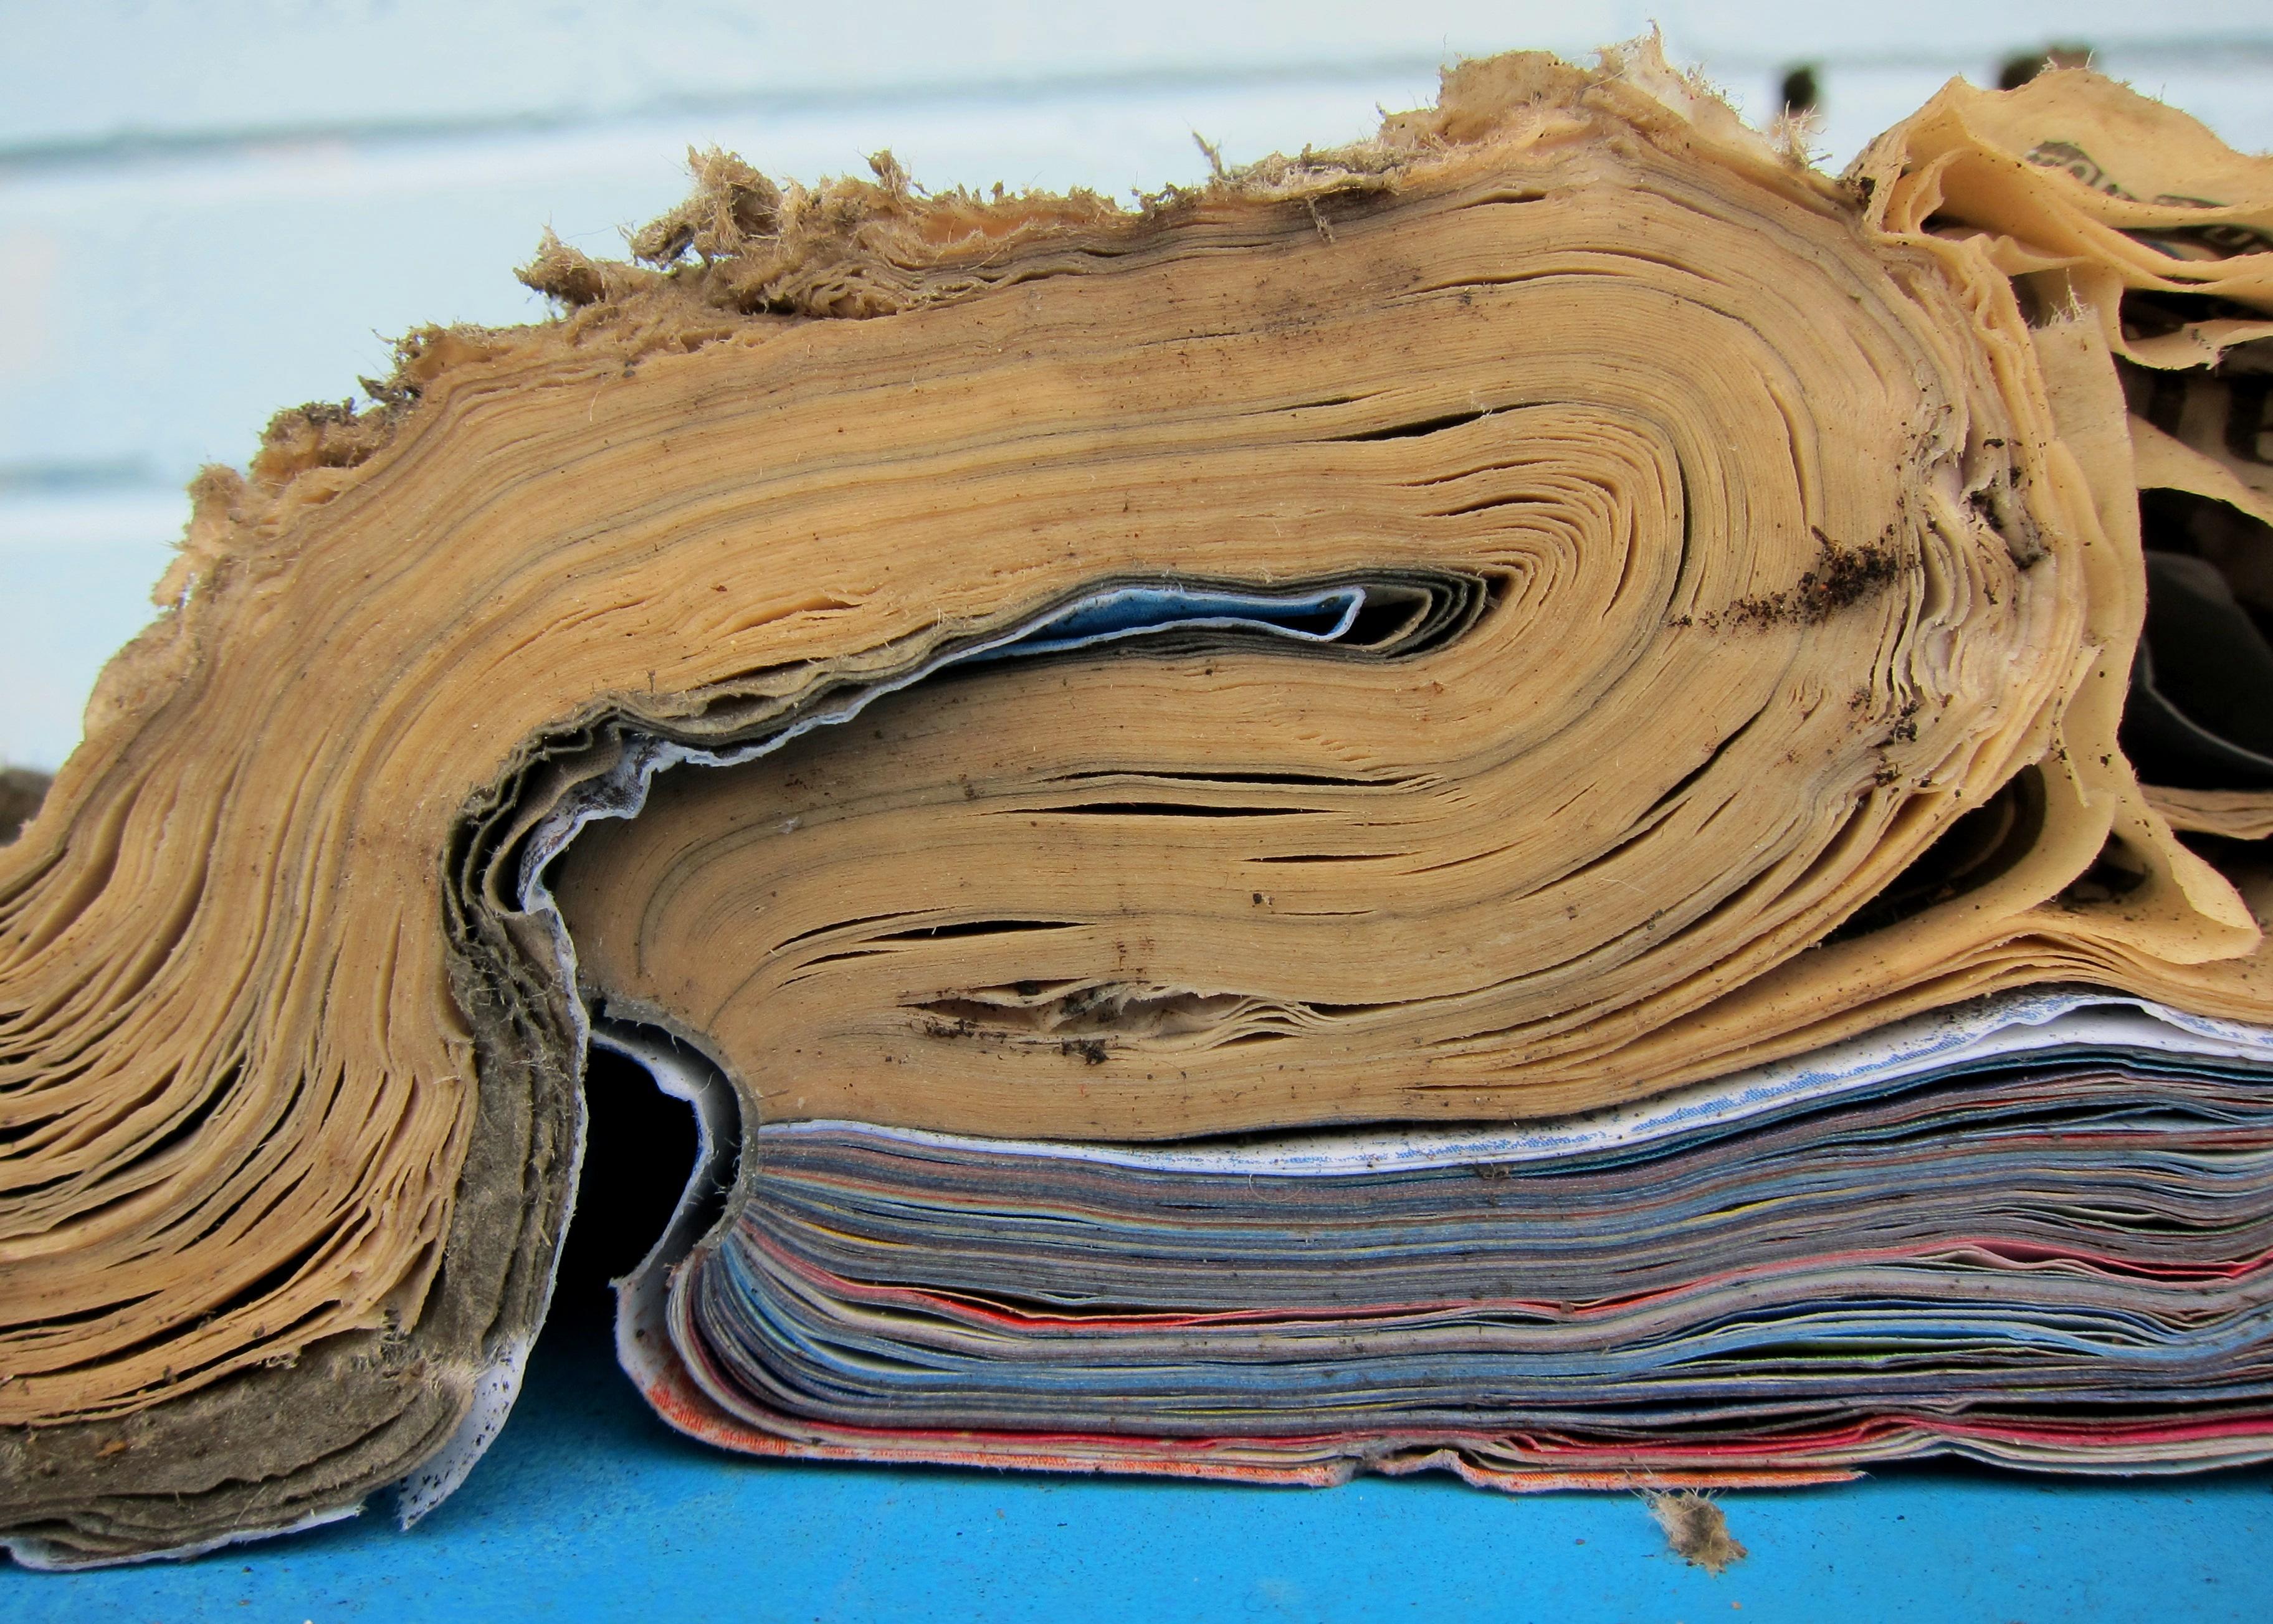 Water-damaged Book